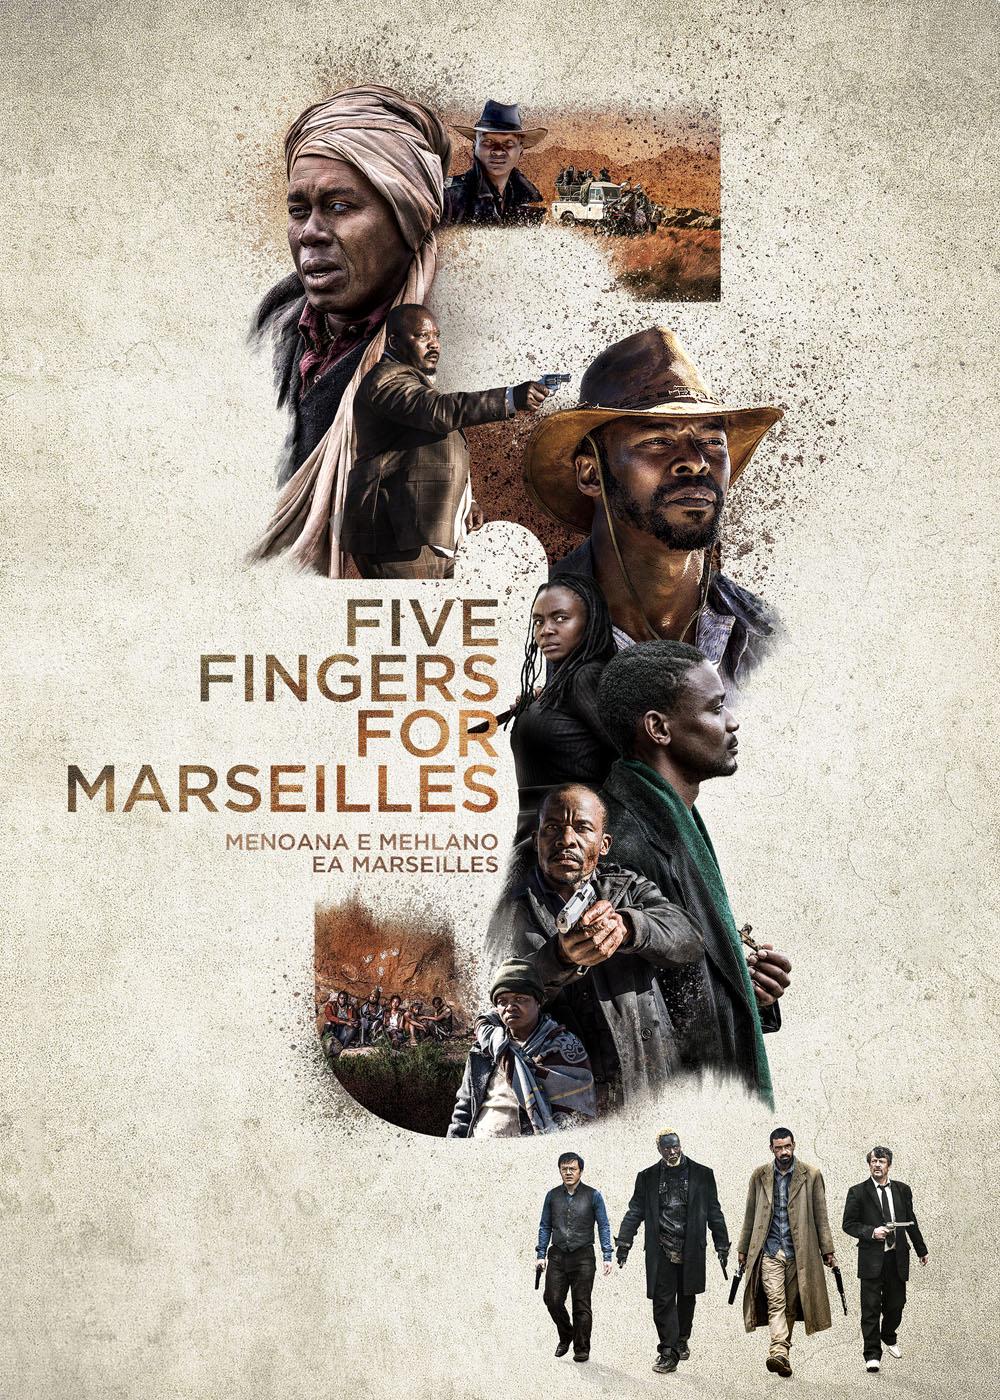 fivefingersformarseilles_poster.jpg